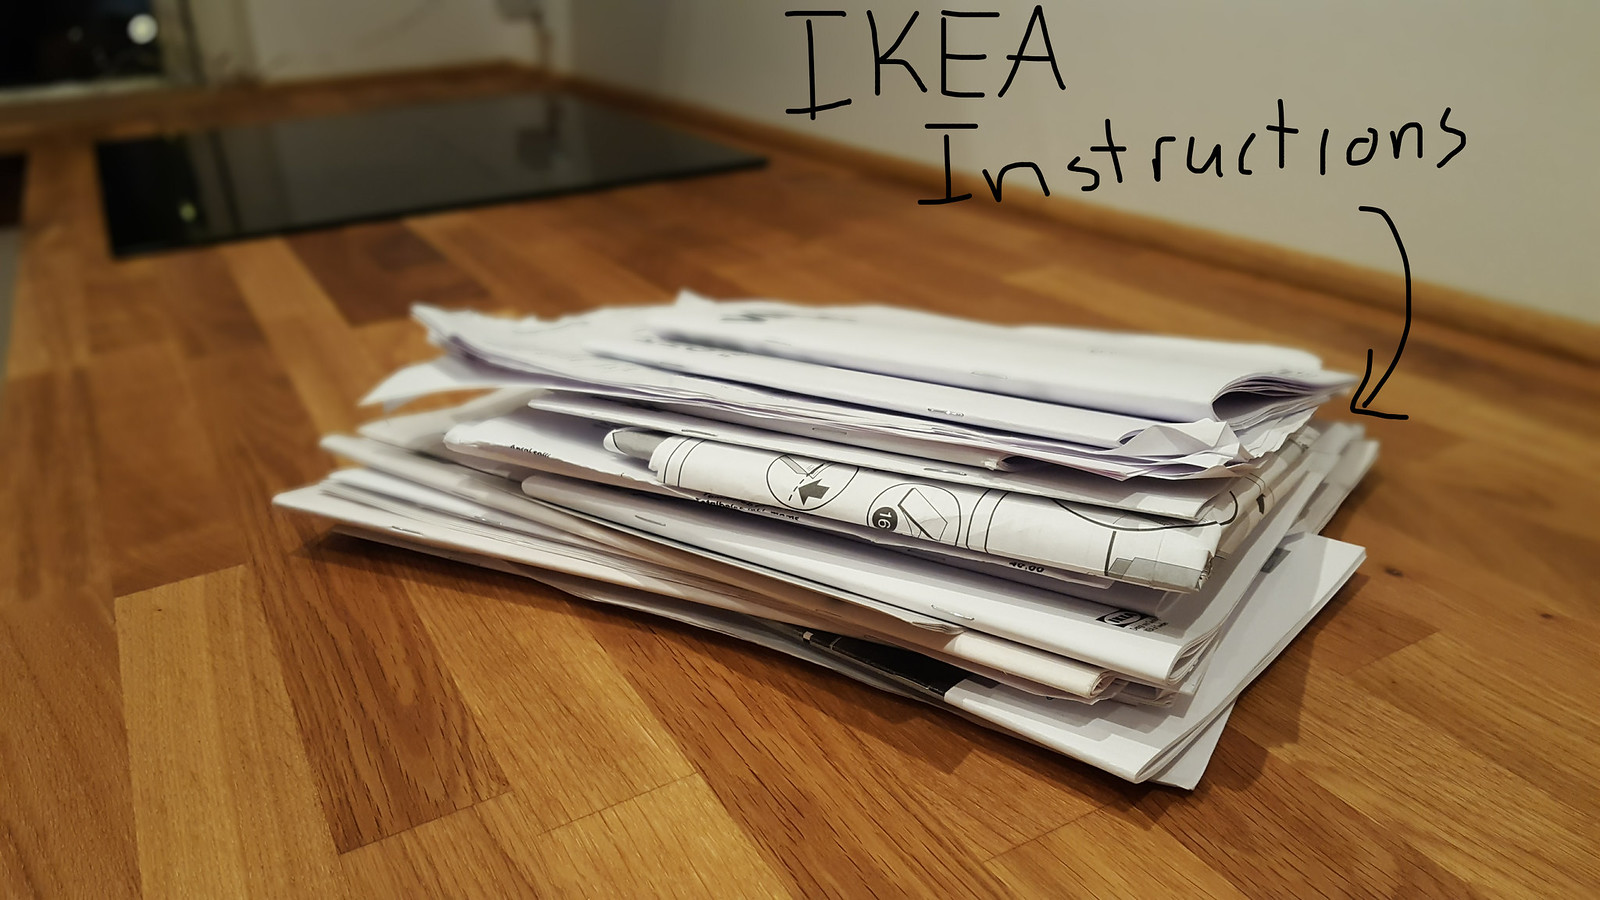 Design your own IKEA kitchen